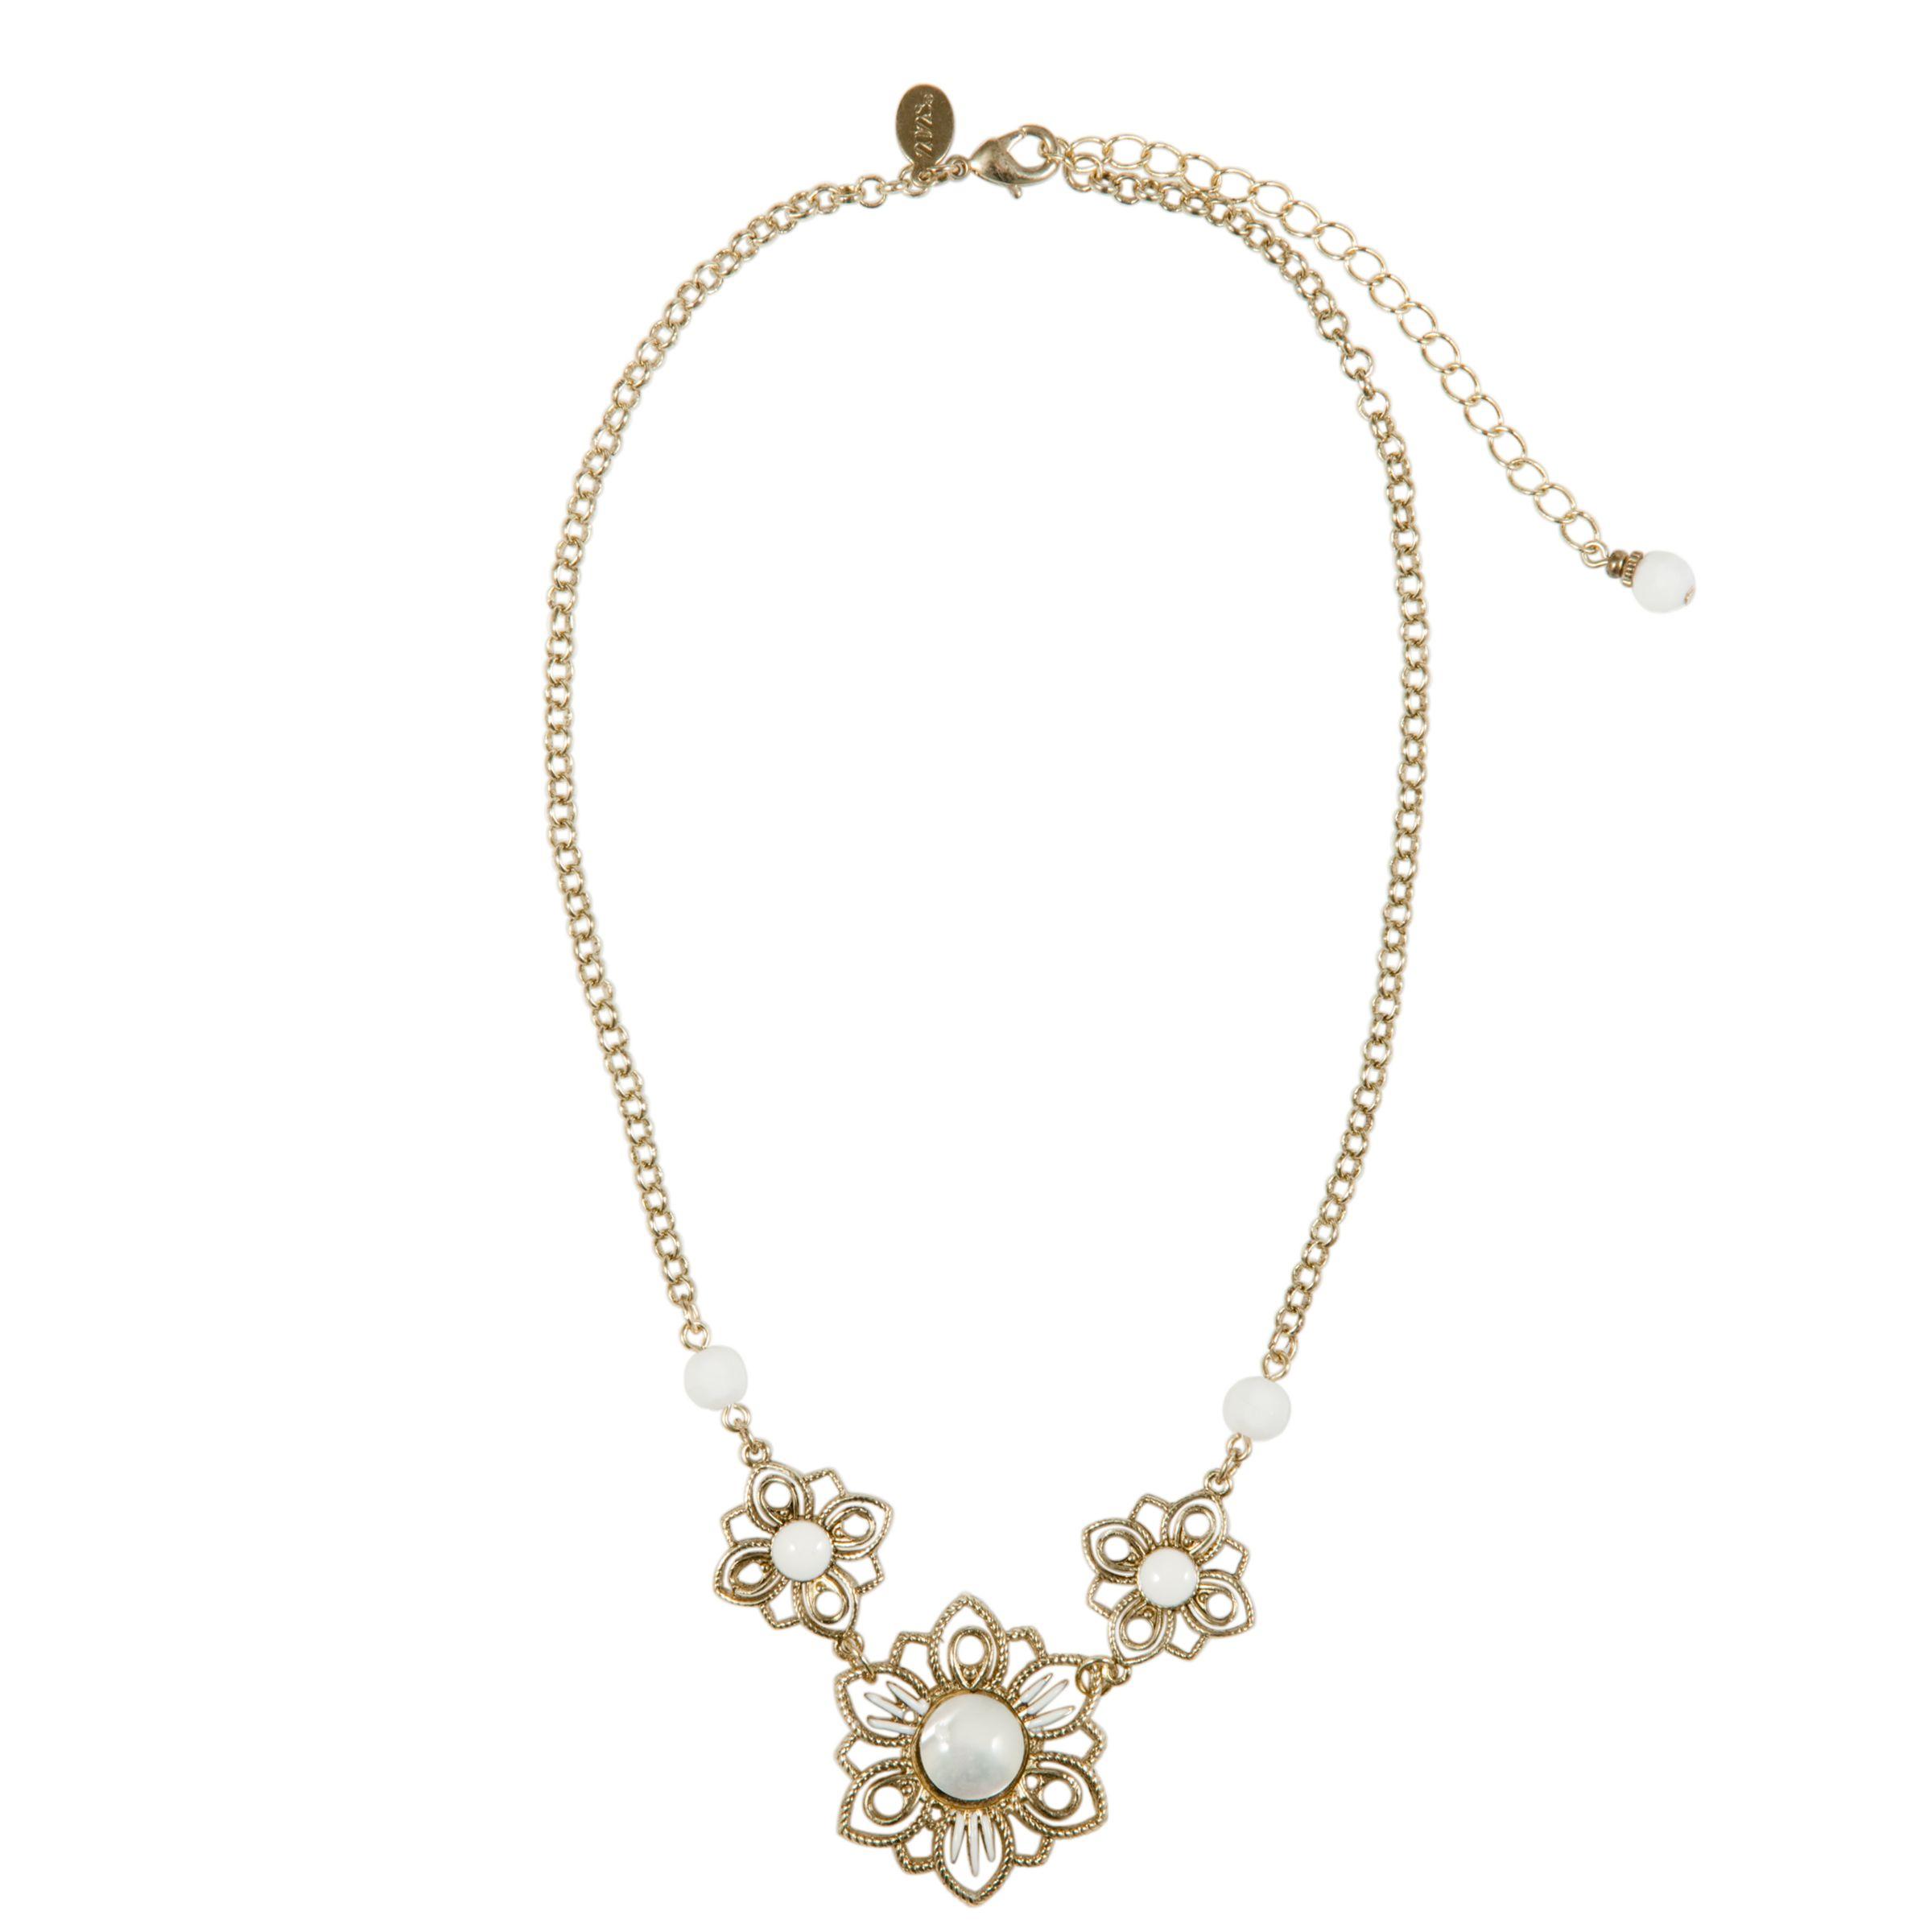 1928 New York Ivory Coast Vintage Brass Filigree Flower Pendant Necklace